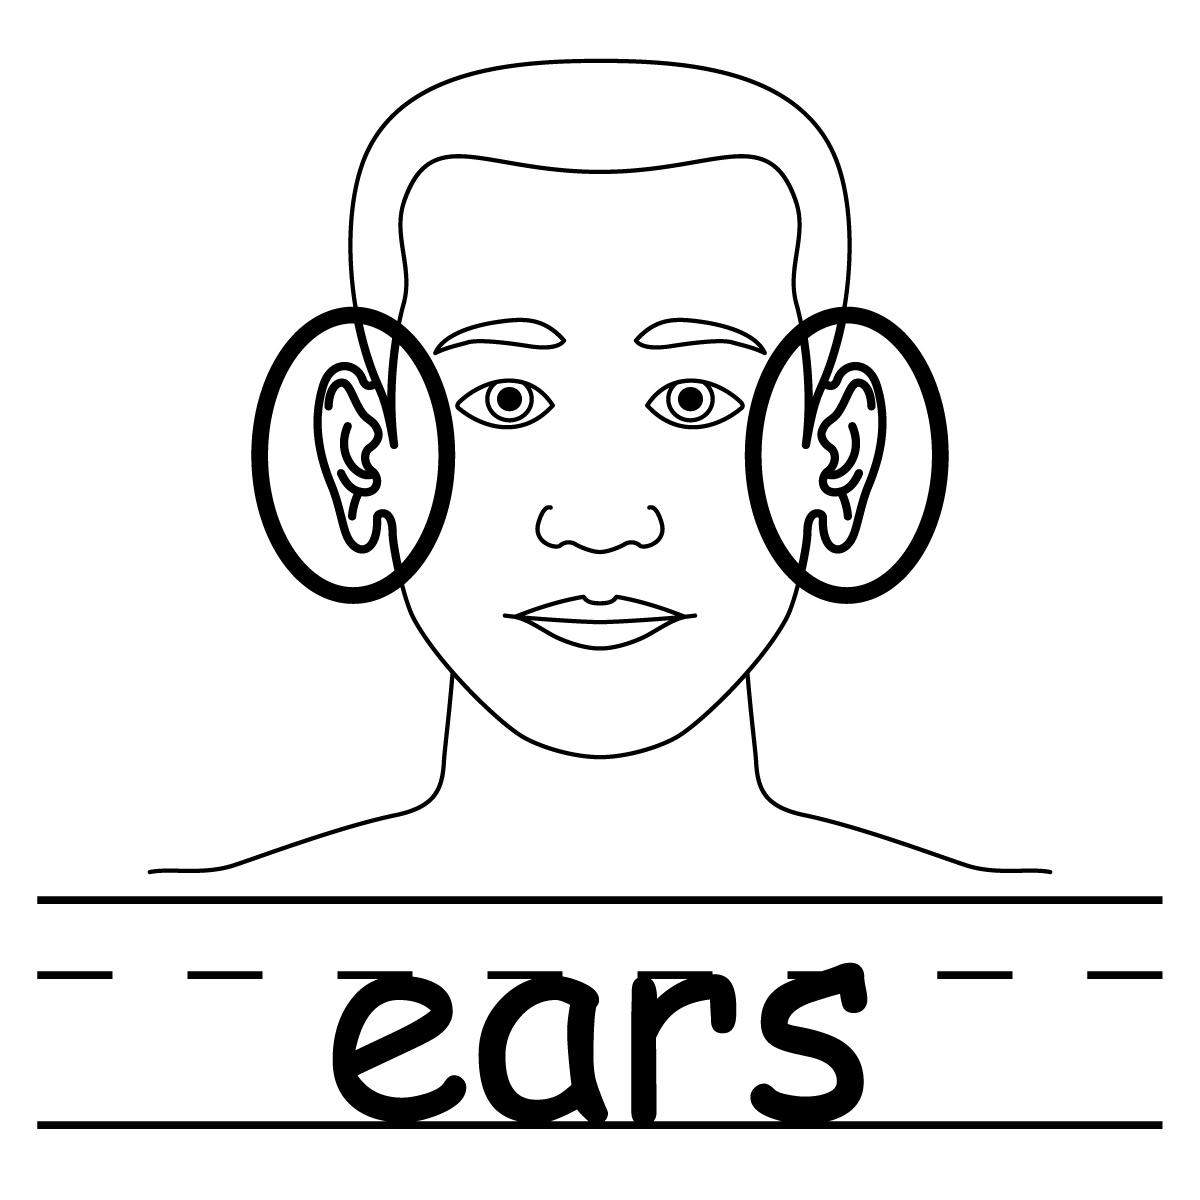 Free download clip art. Ears clipart part head